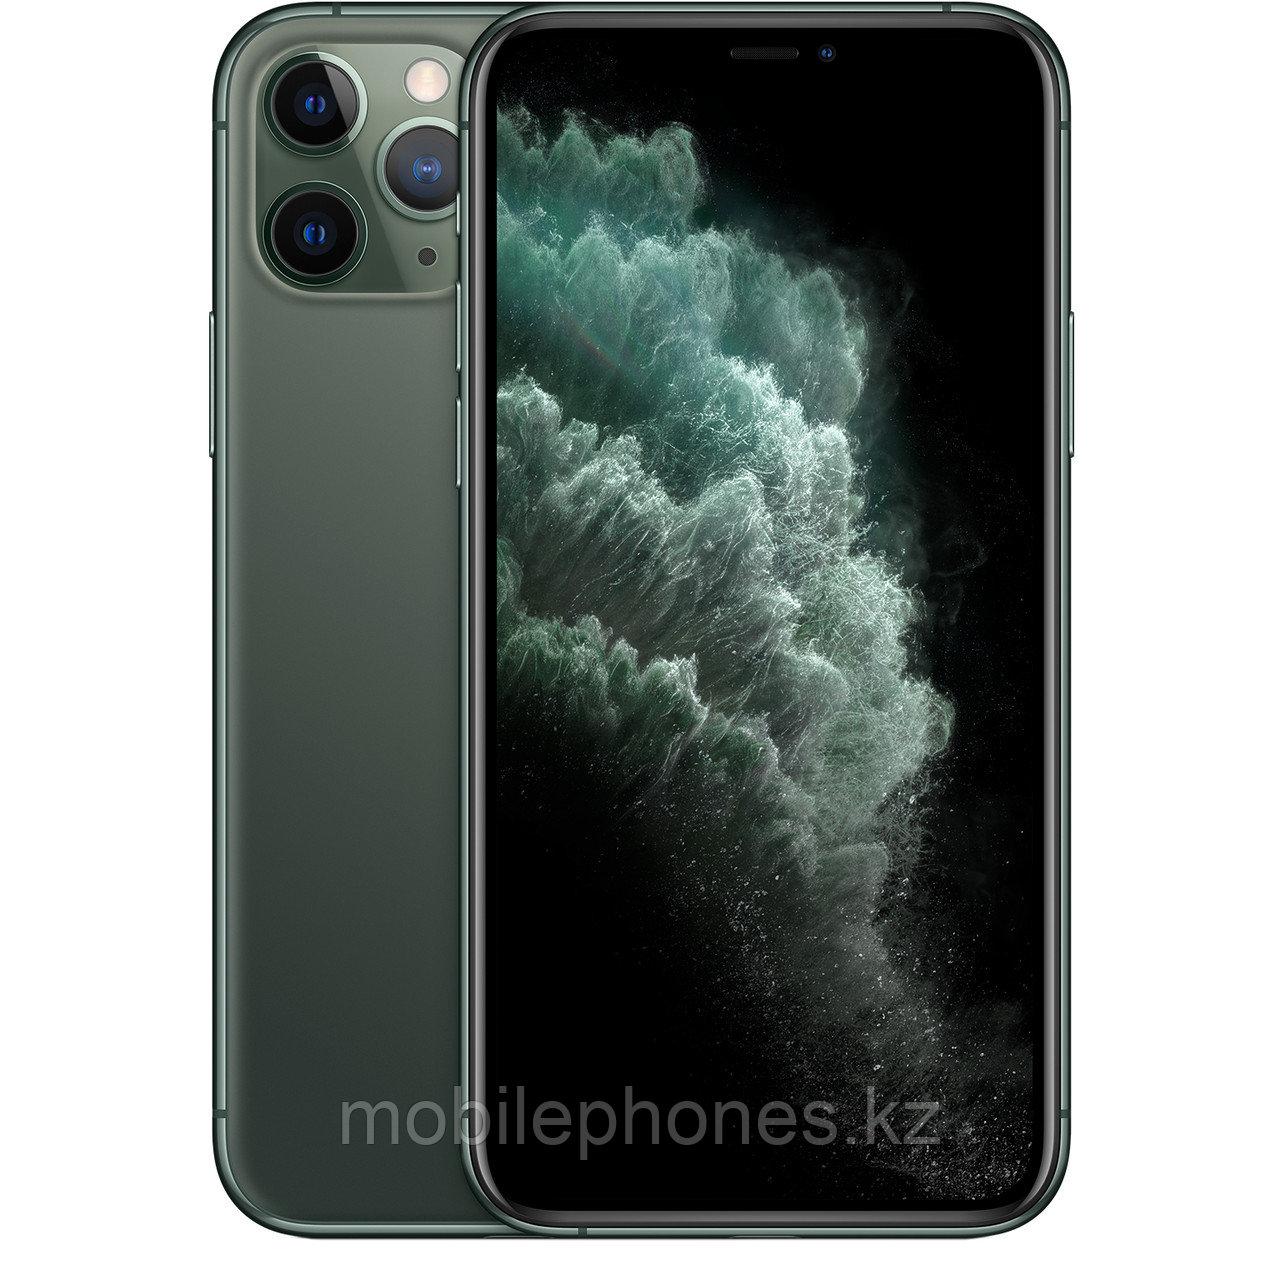 Смартфон Apple IPhone 11 Pro Max 256Gb OLD BOX Зелёный